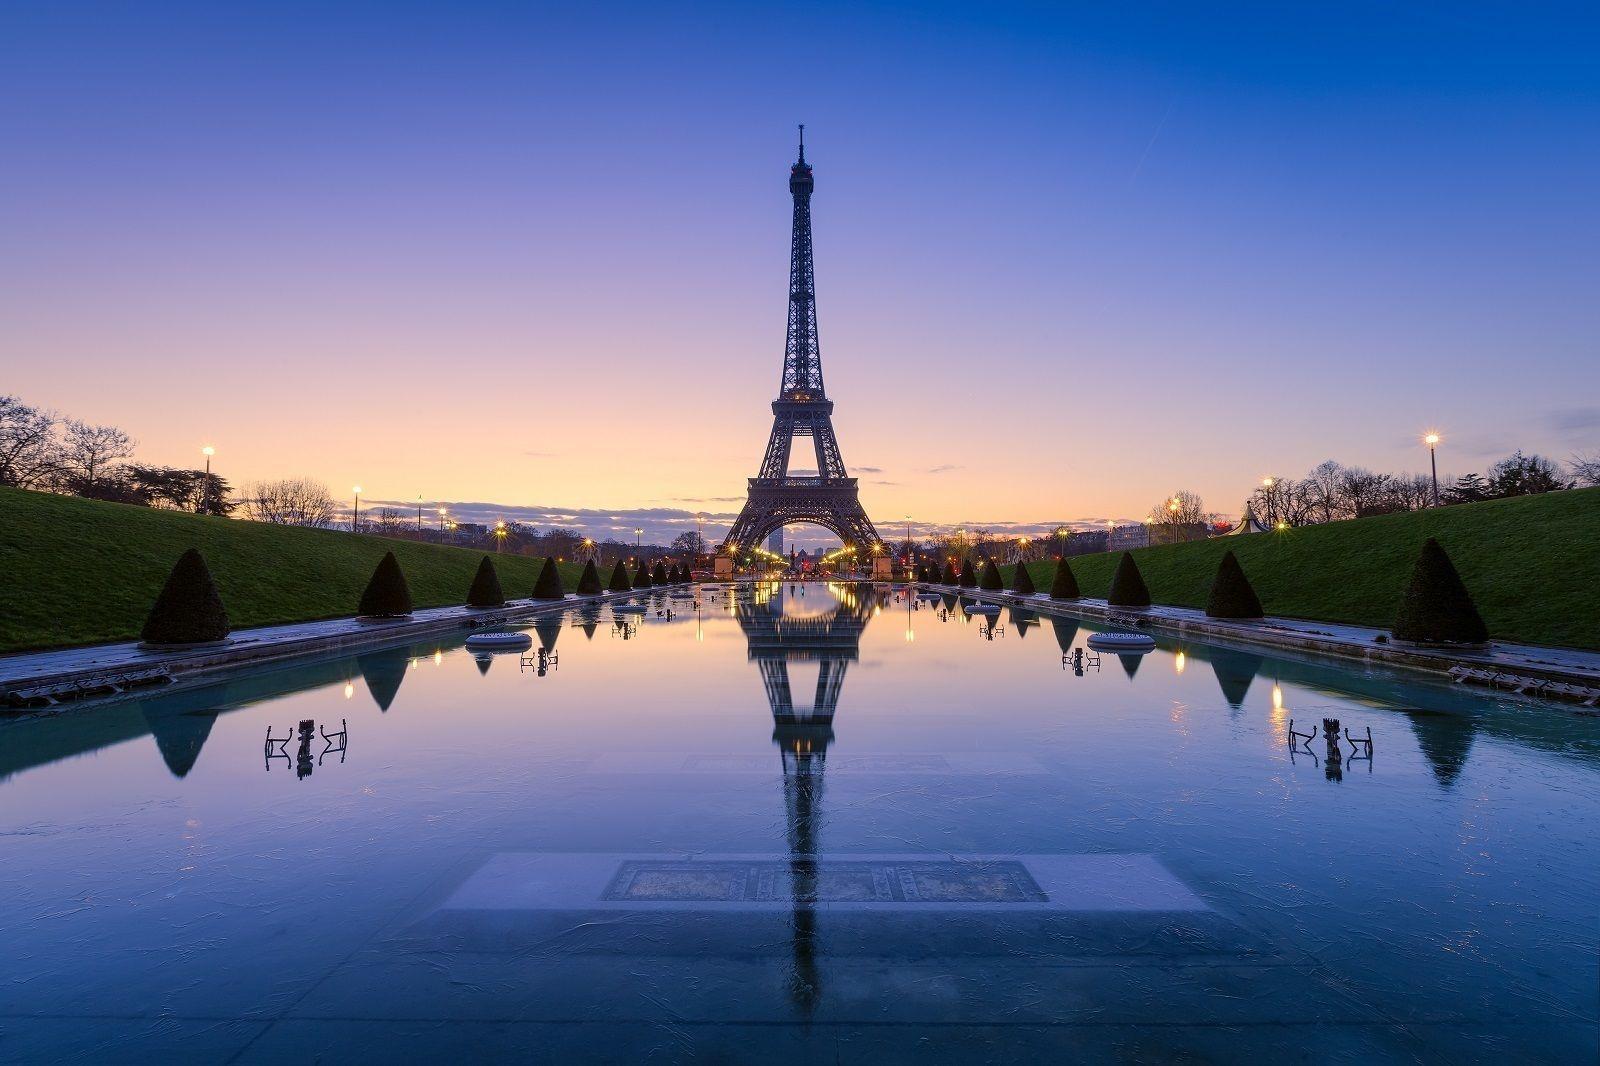 Eiffel Tower at dusk in Paris